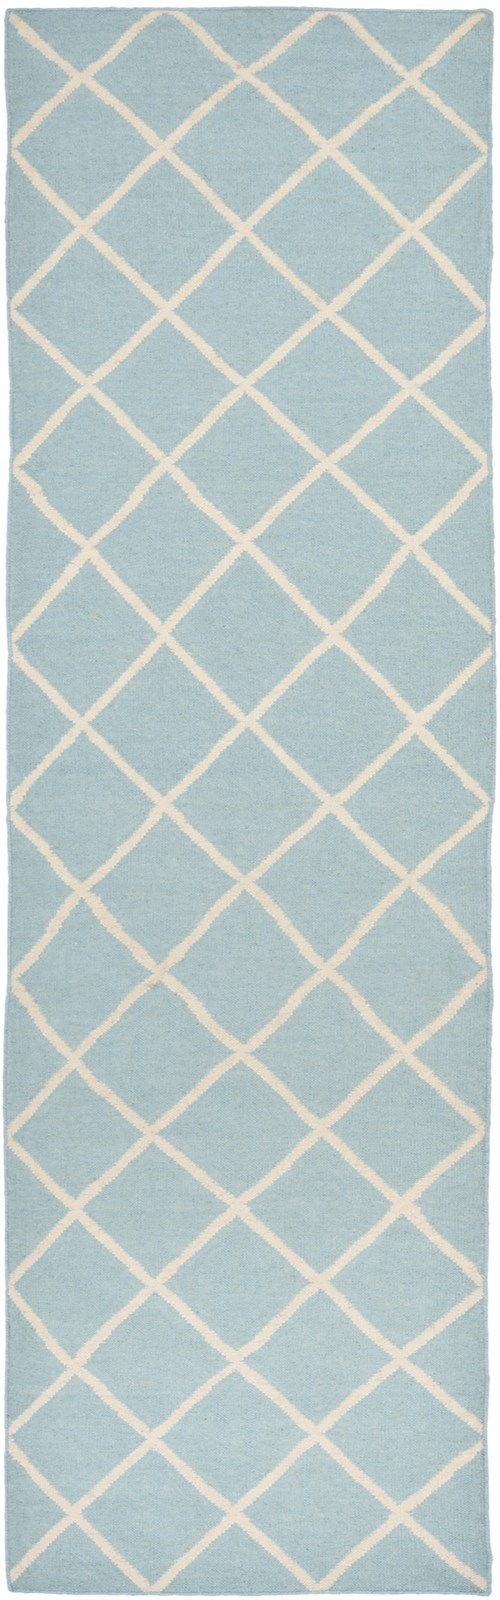 Light Blue, Ivory (B) Transitional Area Rug